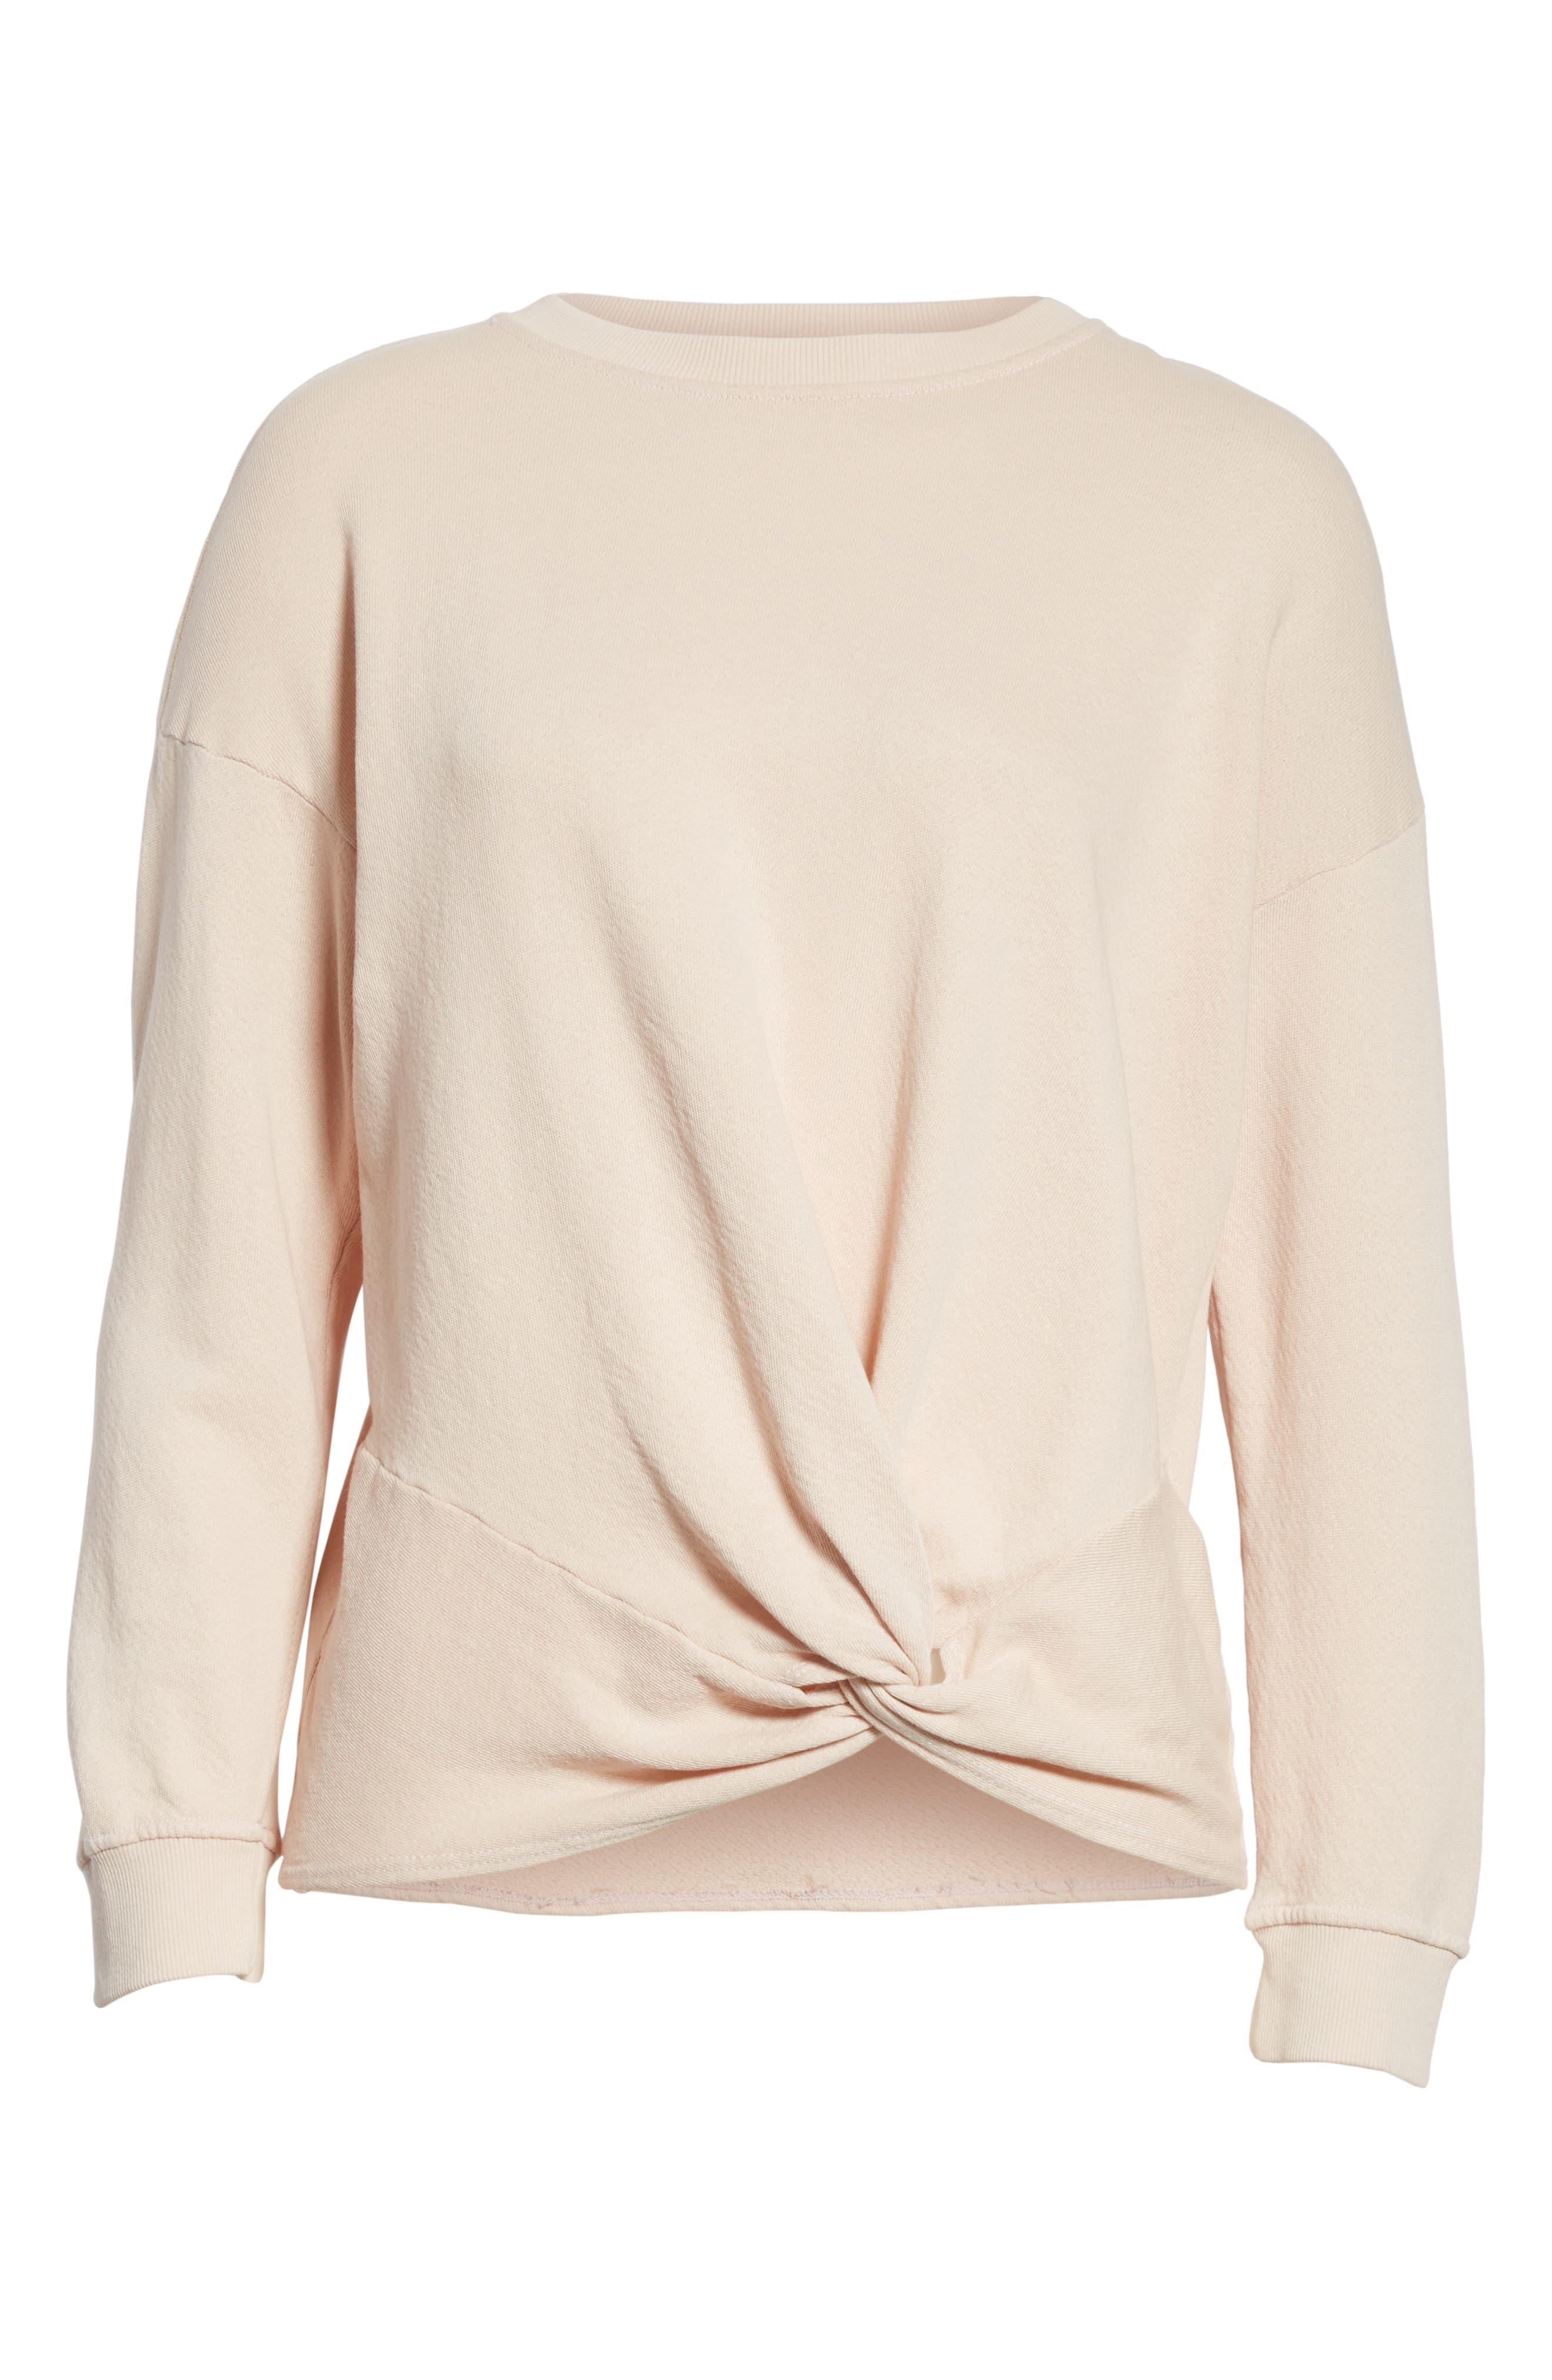 Nazani Twist Front Sweatshirt,                             Alternate thumbnail 6, color,                             687